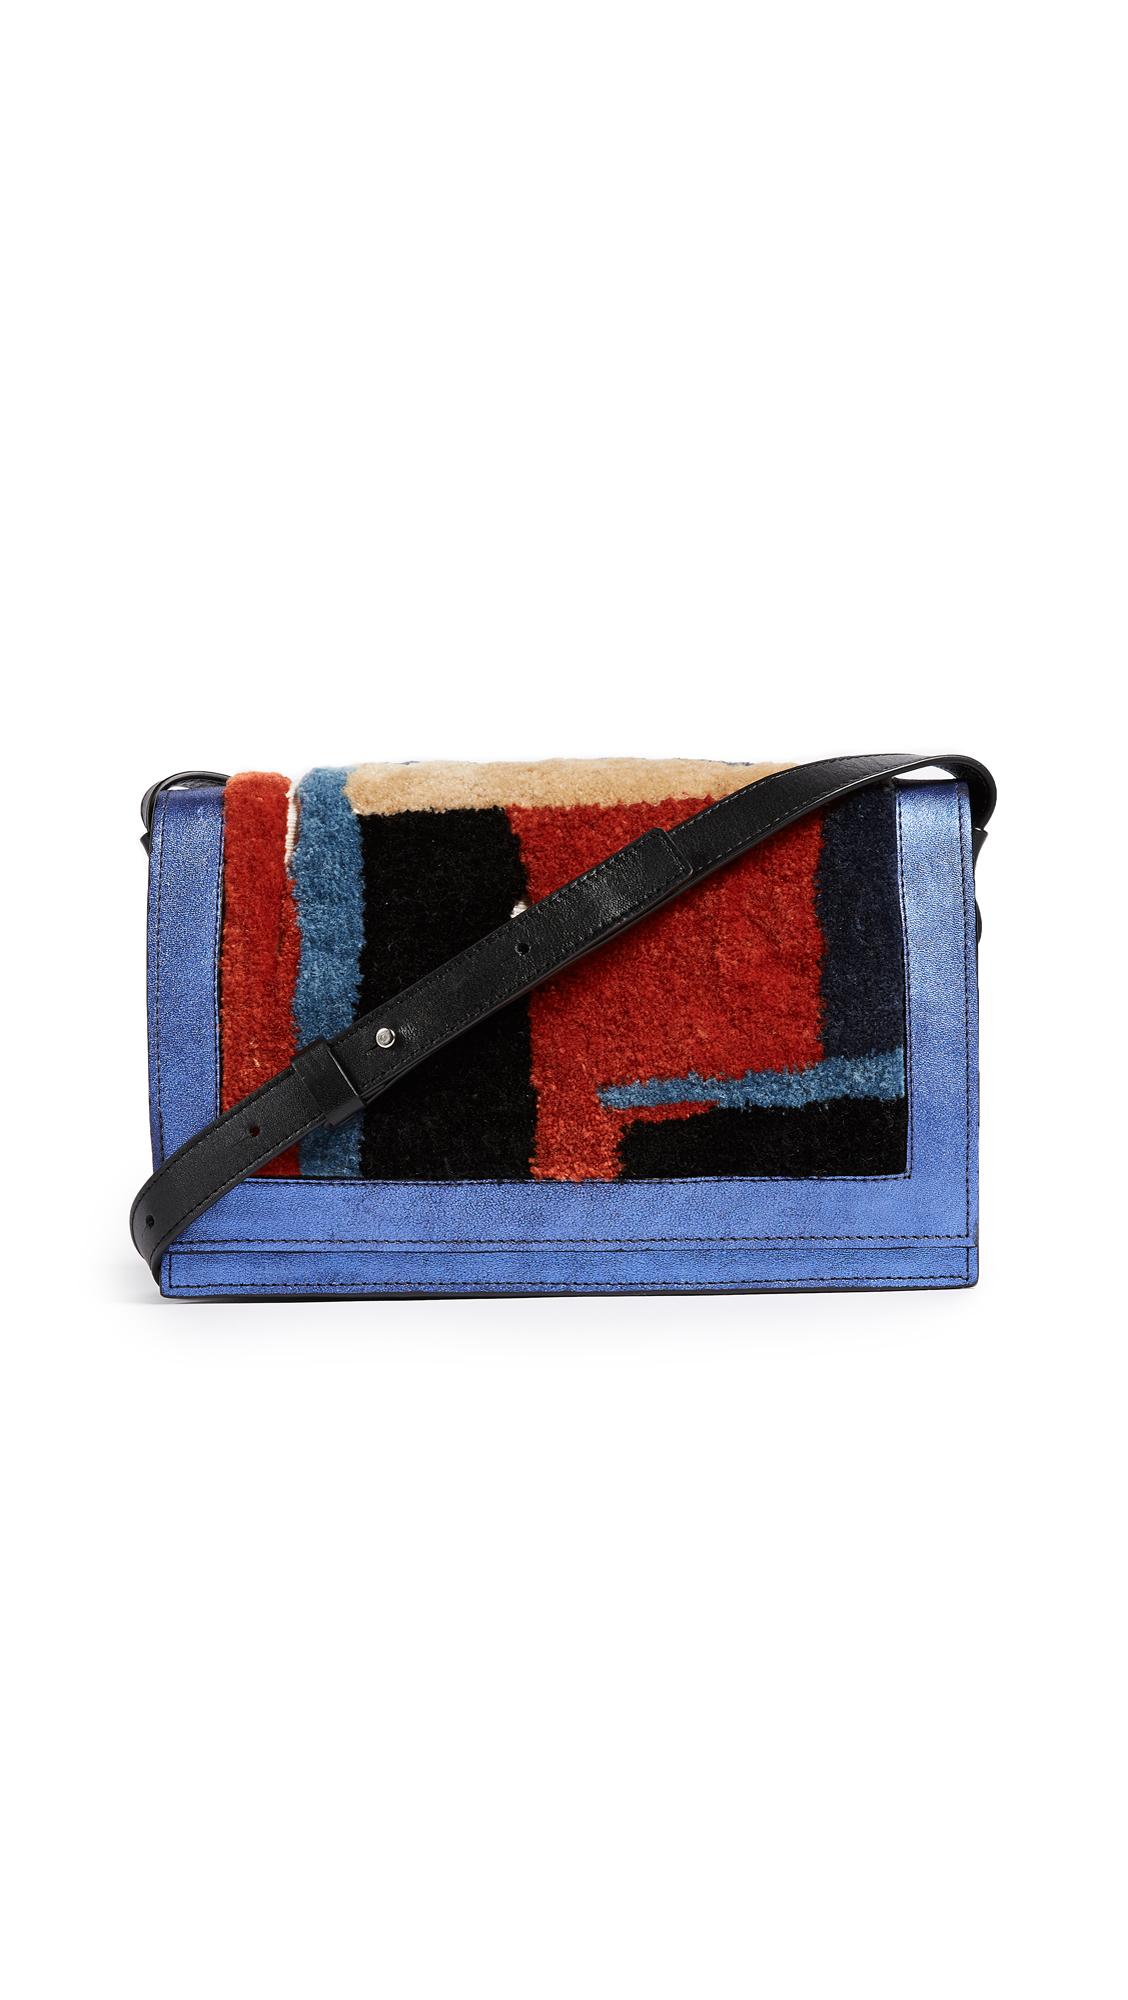 Rachel Comey Pala Shoulder Bag - Dark Blue